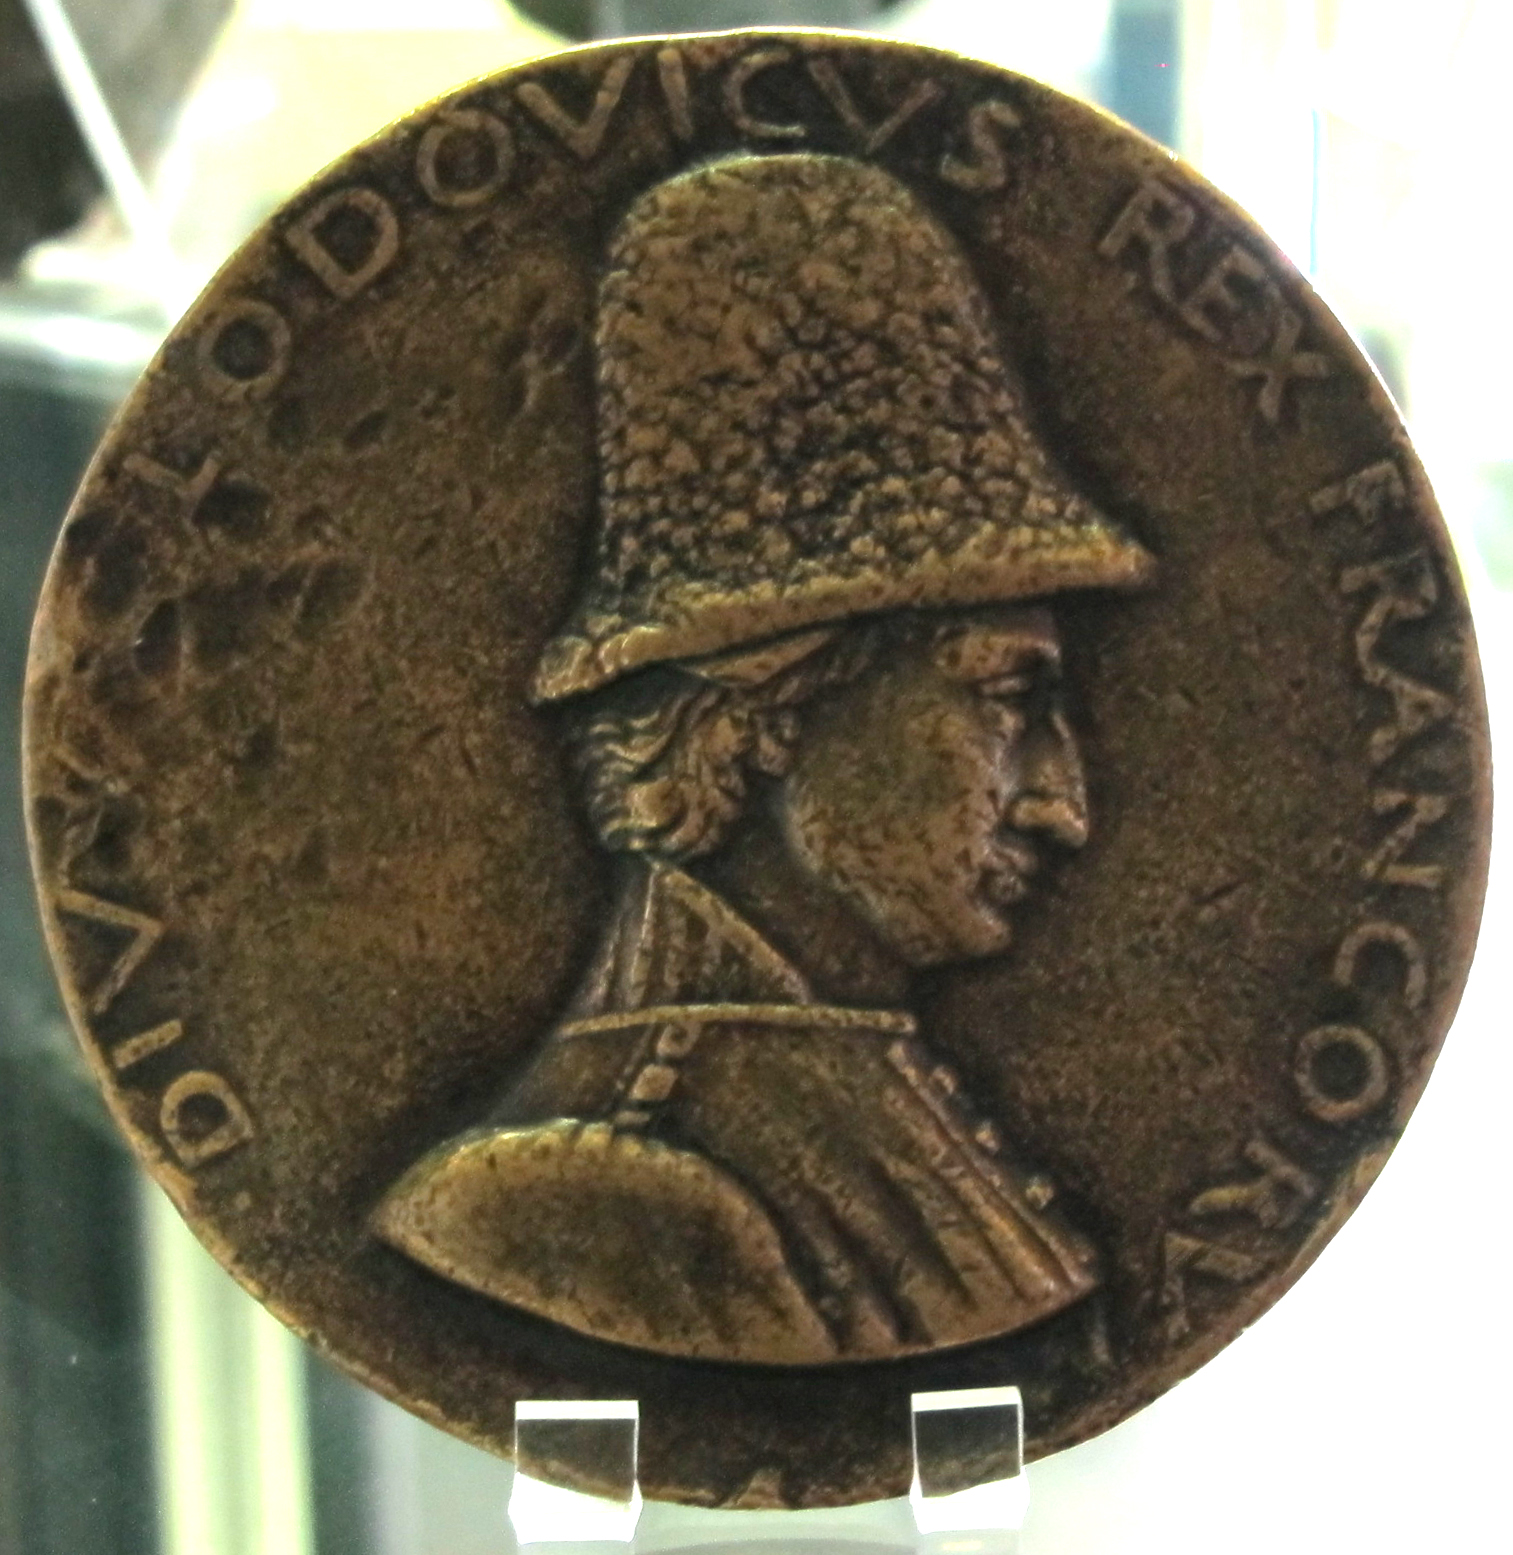 File:Francesco laurana, medaglia di luigi xi, provenza, 1465 ca.